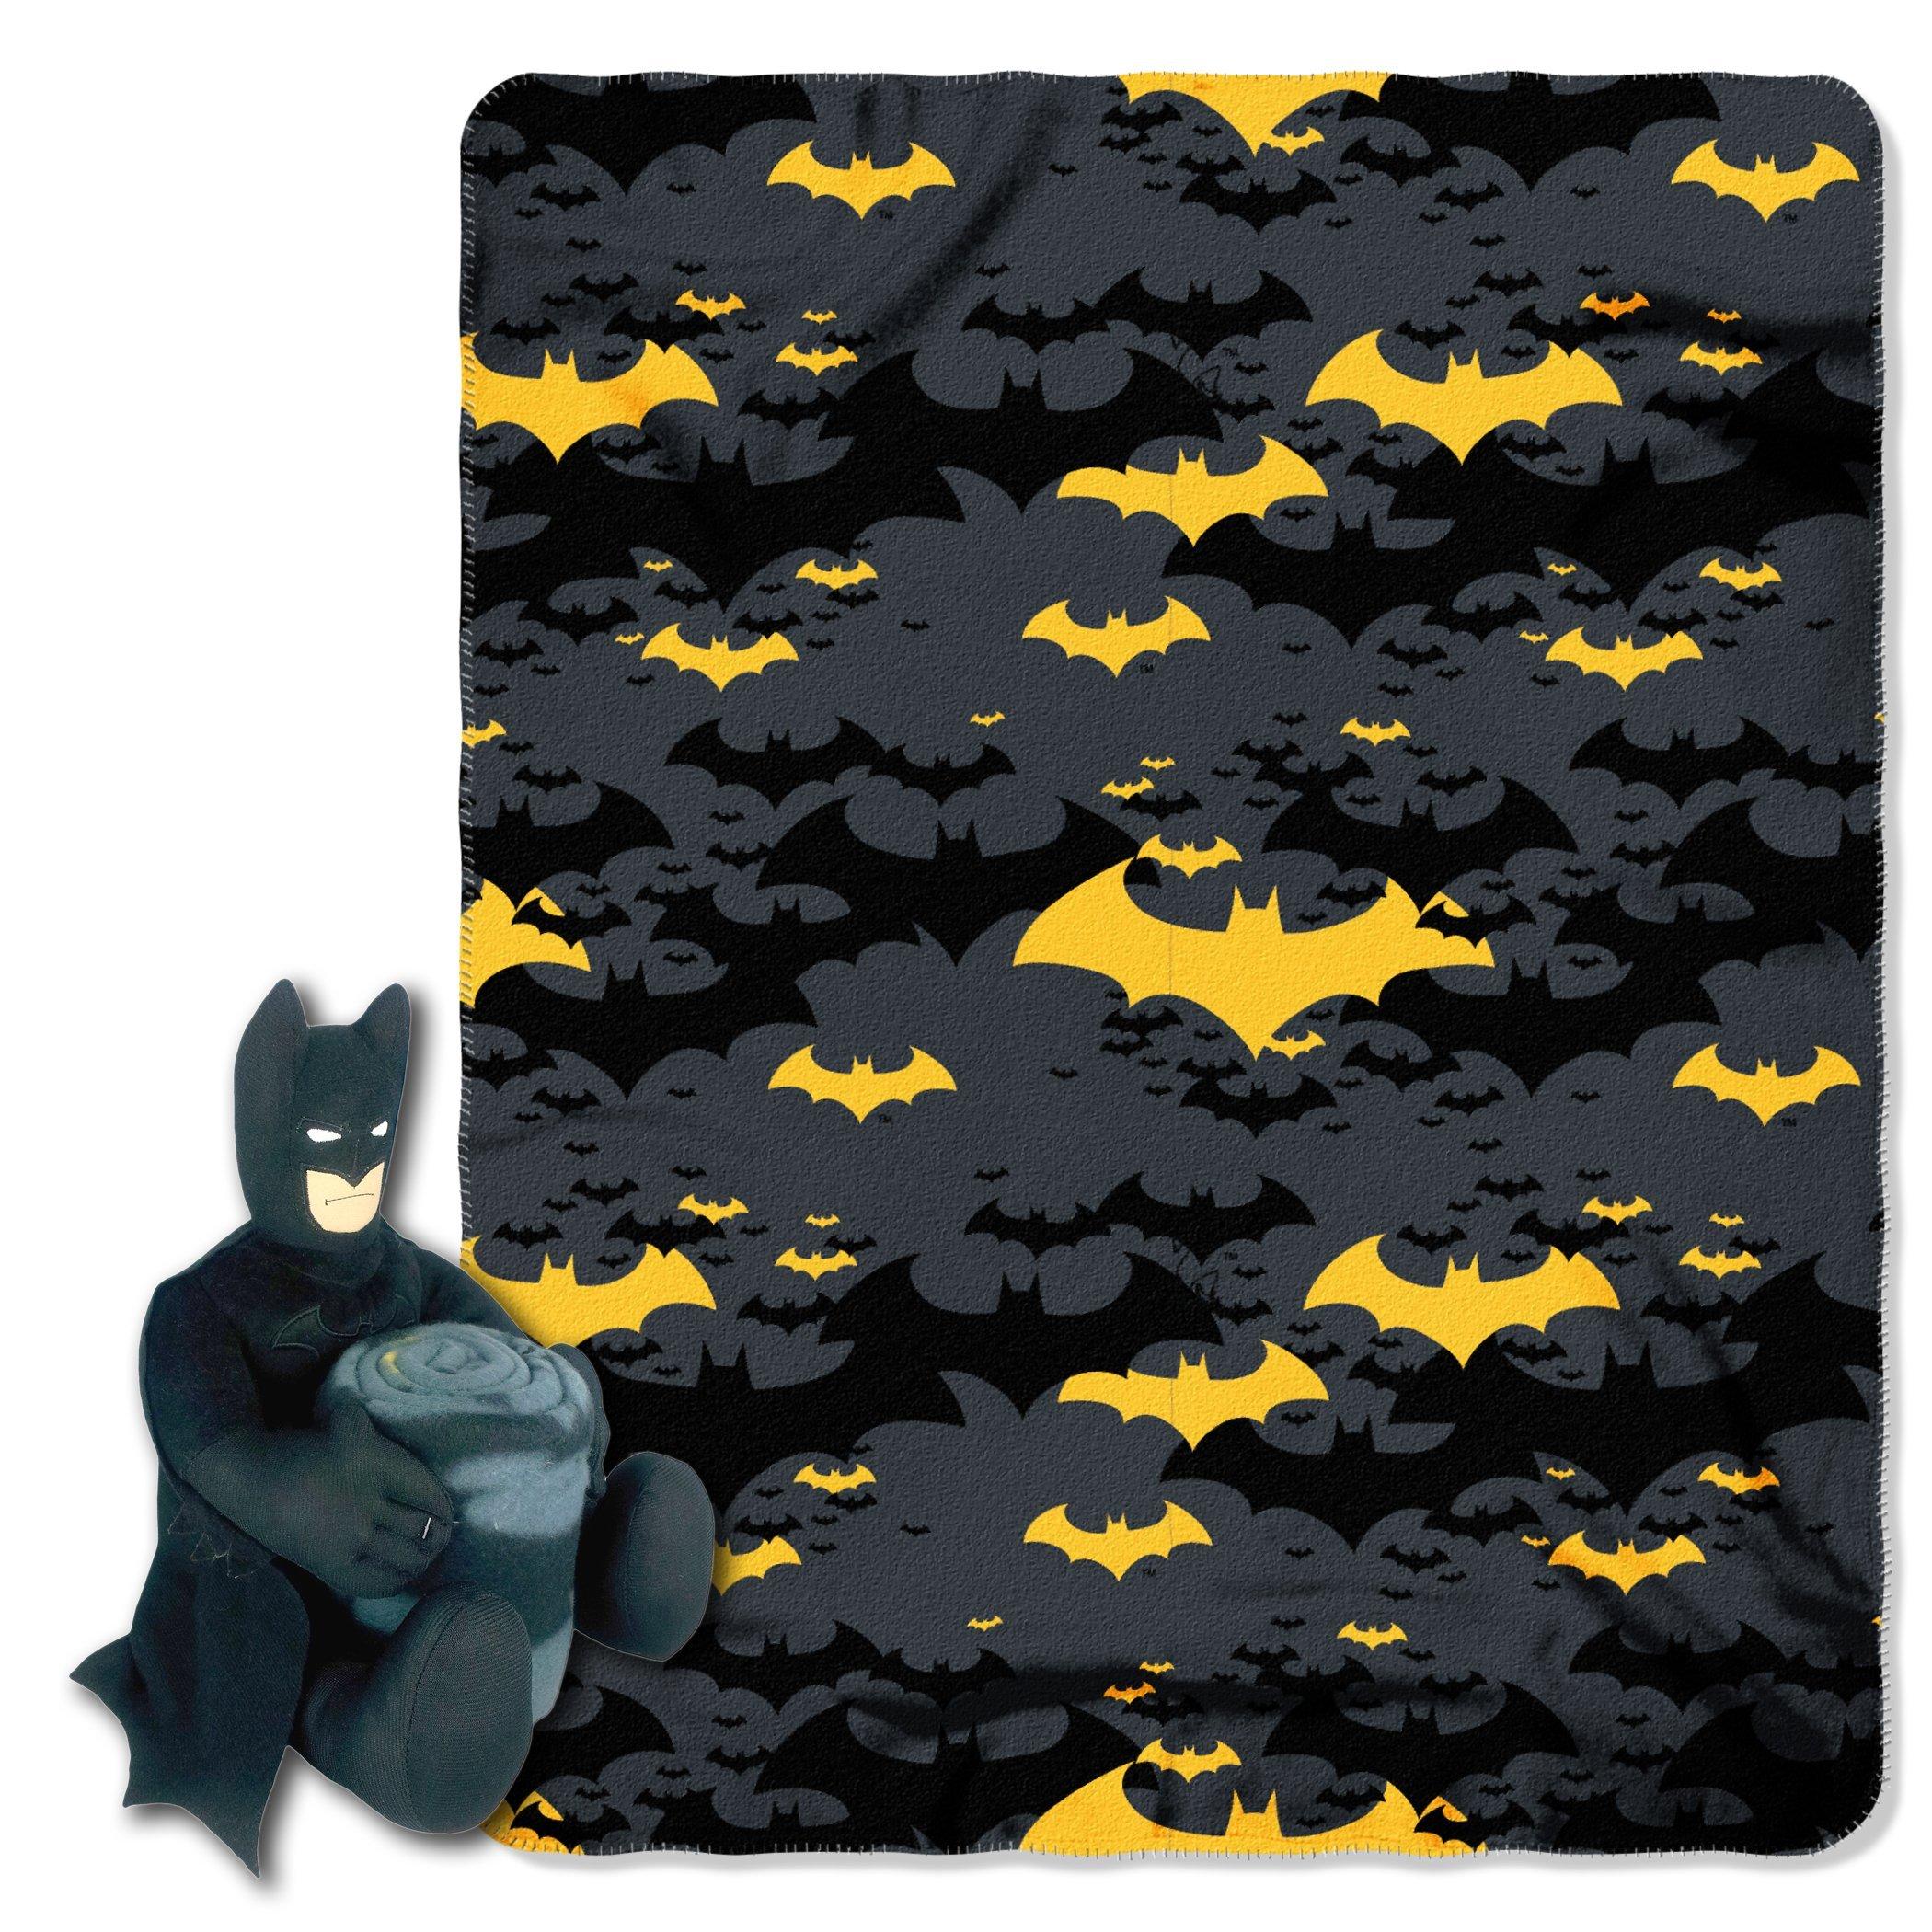 DC Comics Batman, ''Black Knight'' Hugger and Fleece Throw Blanket Set, 40'' x 50'', Multi Color